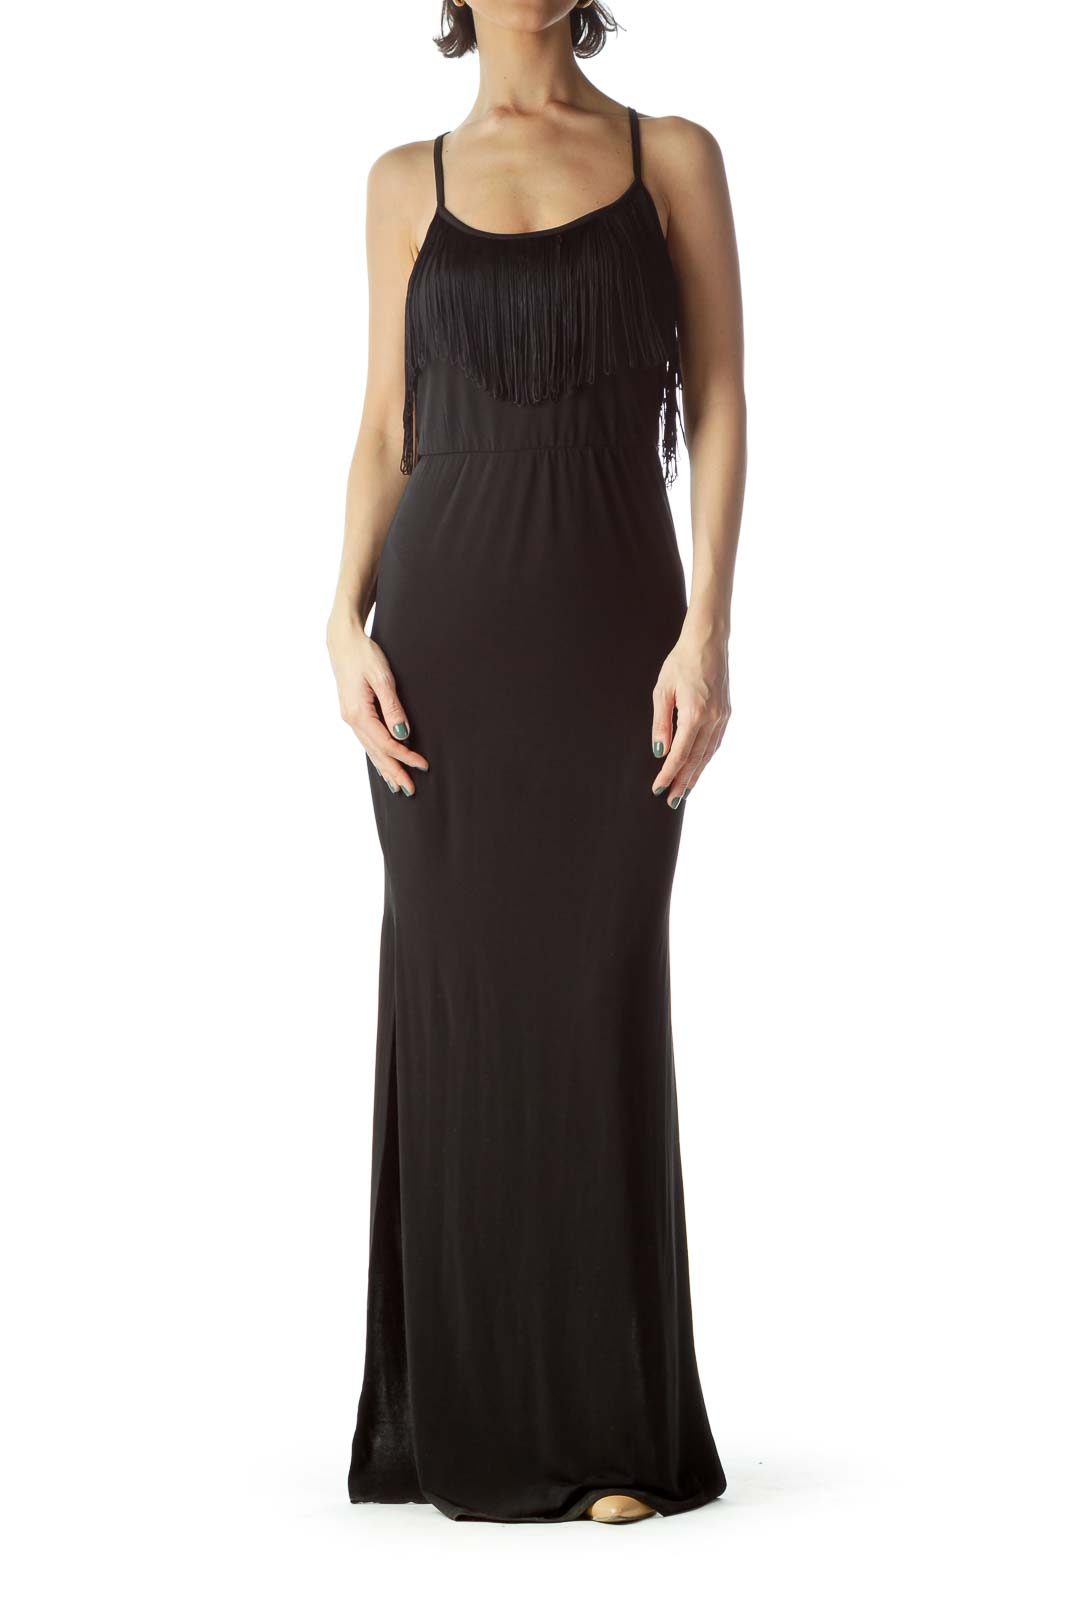 Black Halter Neckline Empire Waist Maxi Dress